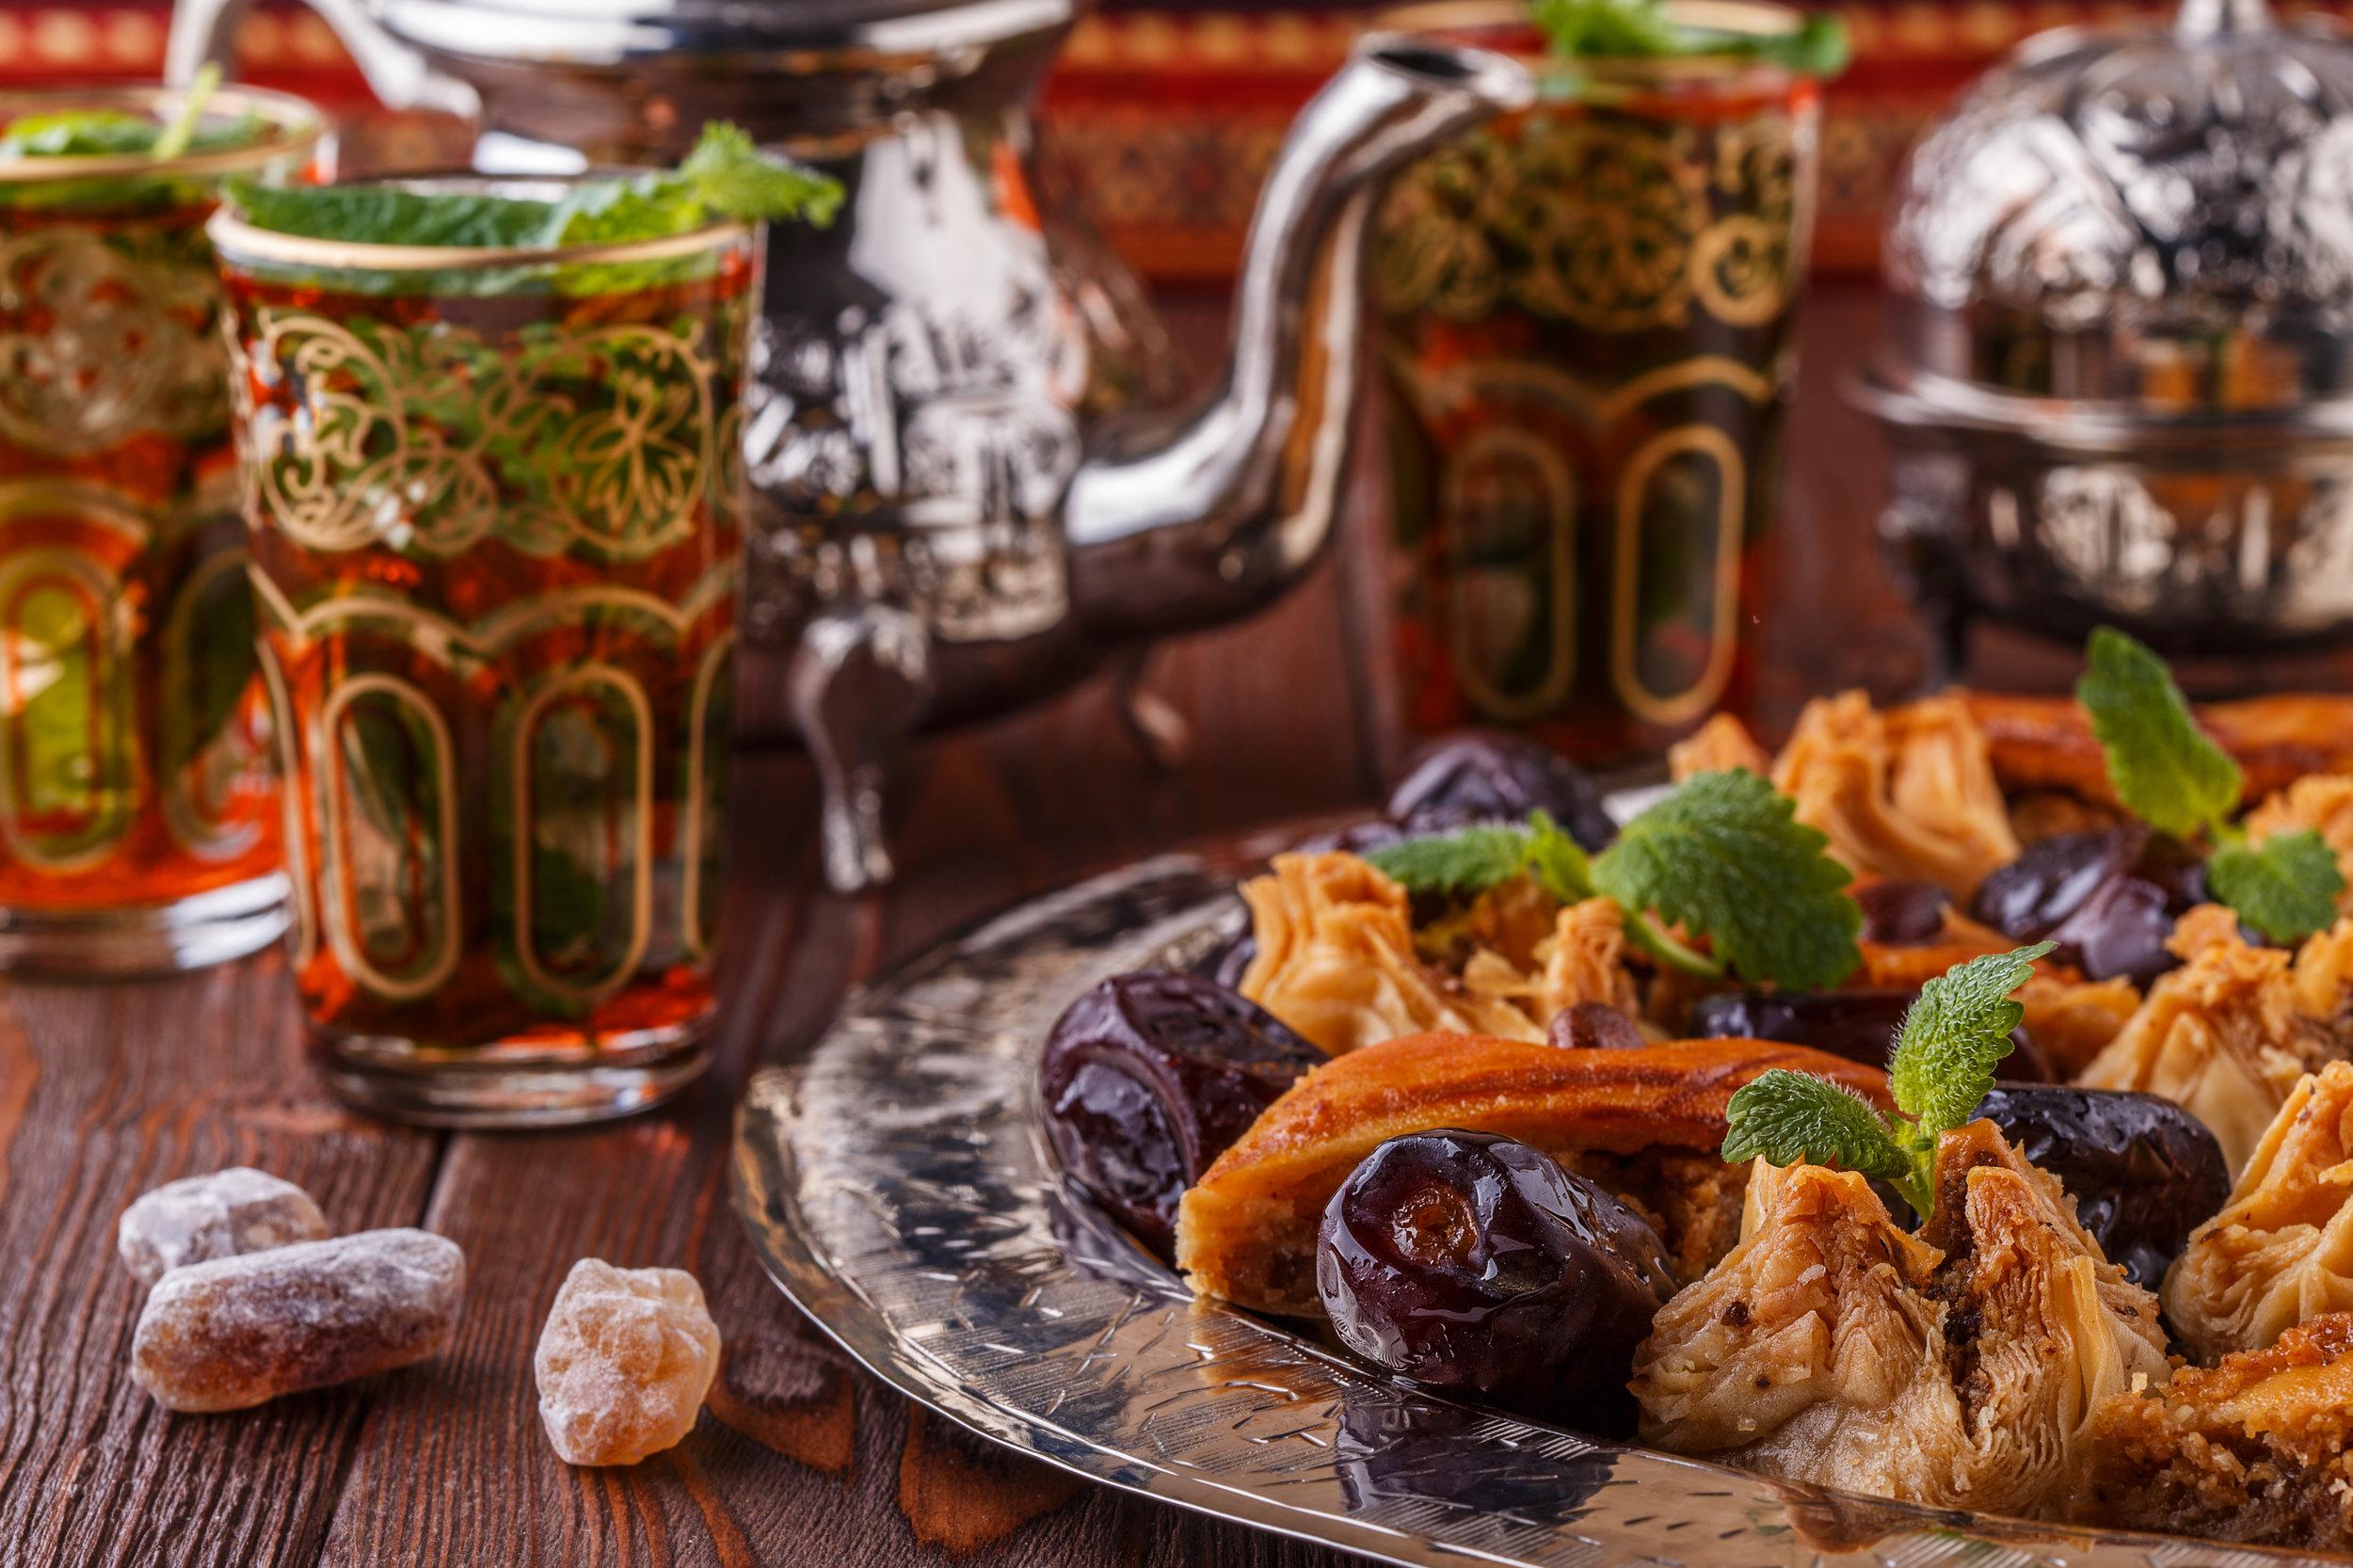 Traditional Moroccan mint tea